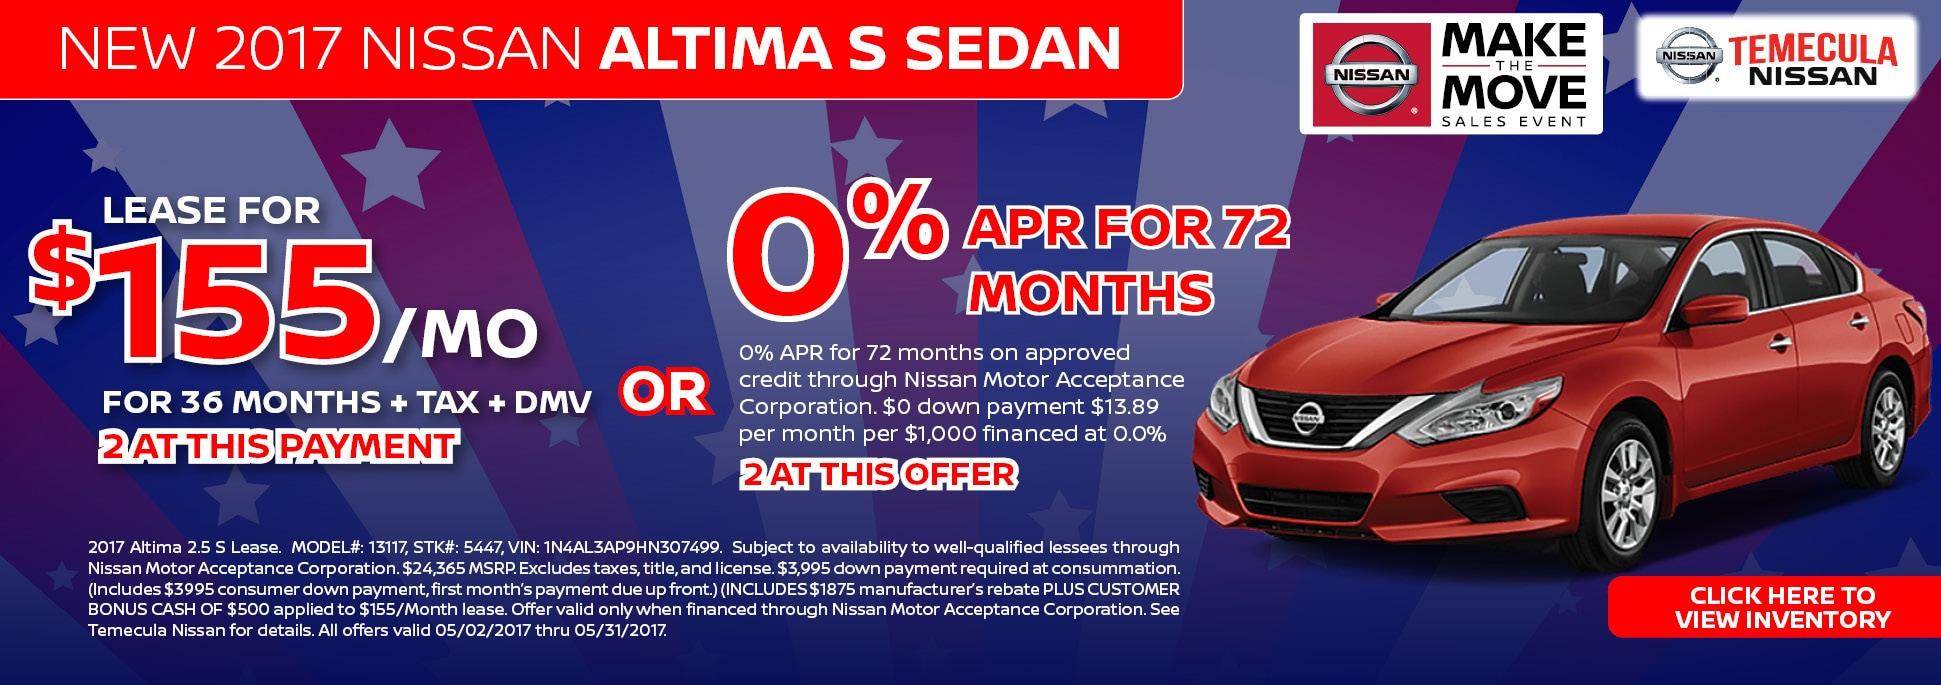 Nissan Motor Acceptance Corporation Payment Address Newmotorspot Co